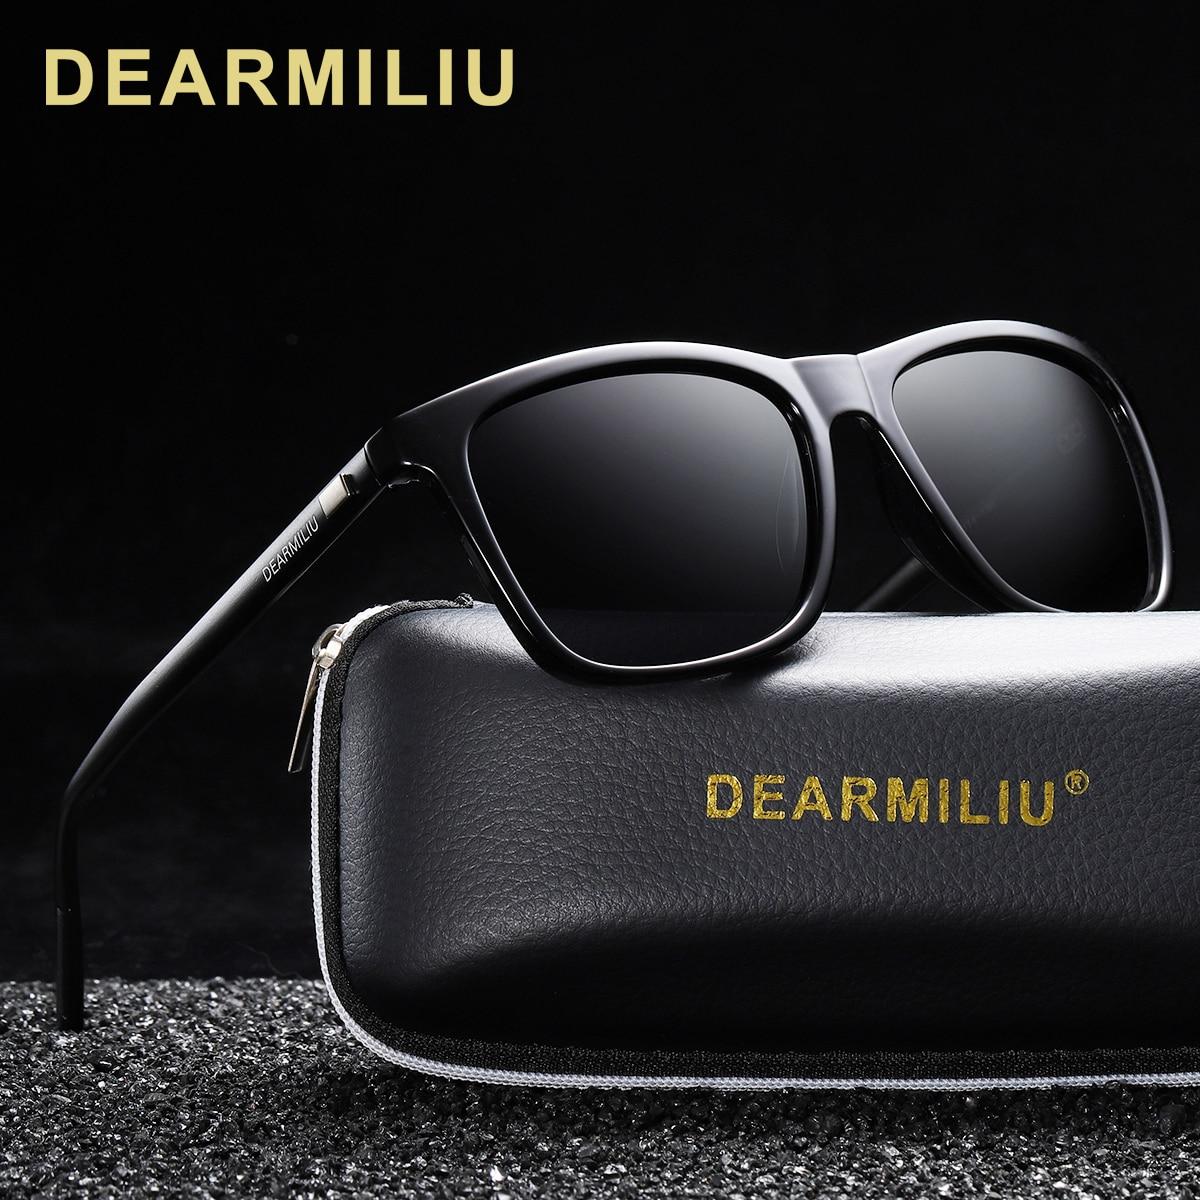 DEARMILIU Brand Unisex Retro Aluminum+TR90 Sunglasses Polarized Lens Vintage Eyewear Accessories Sun Glasses For Men/Women 6108